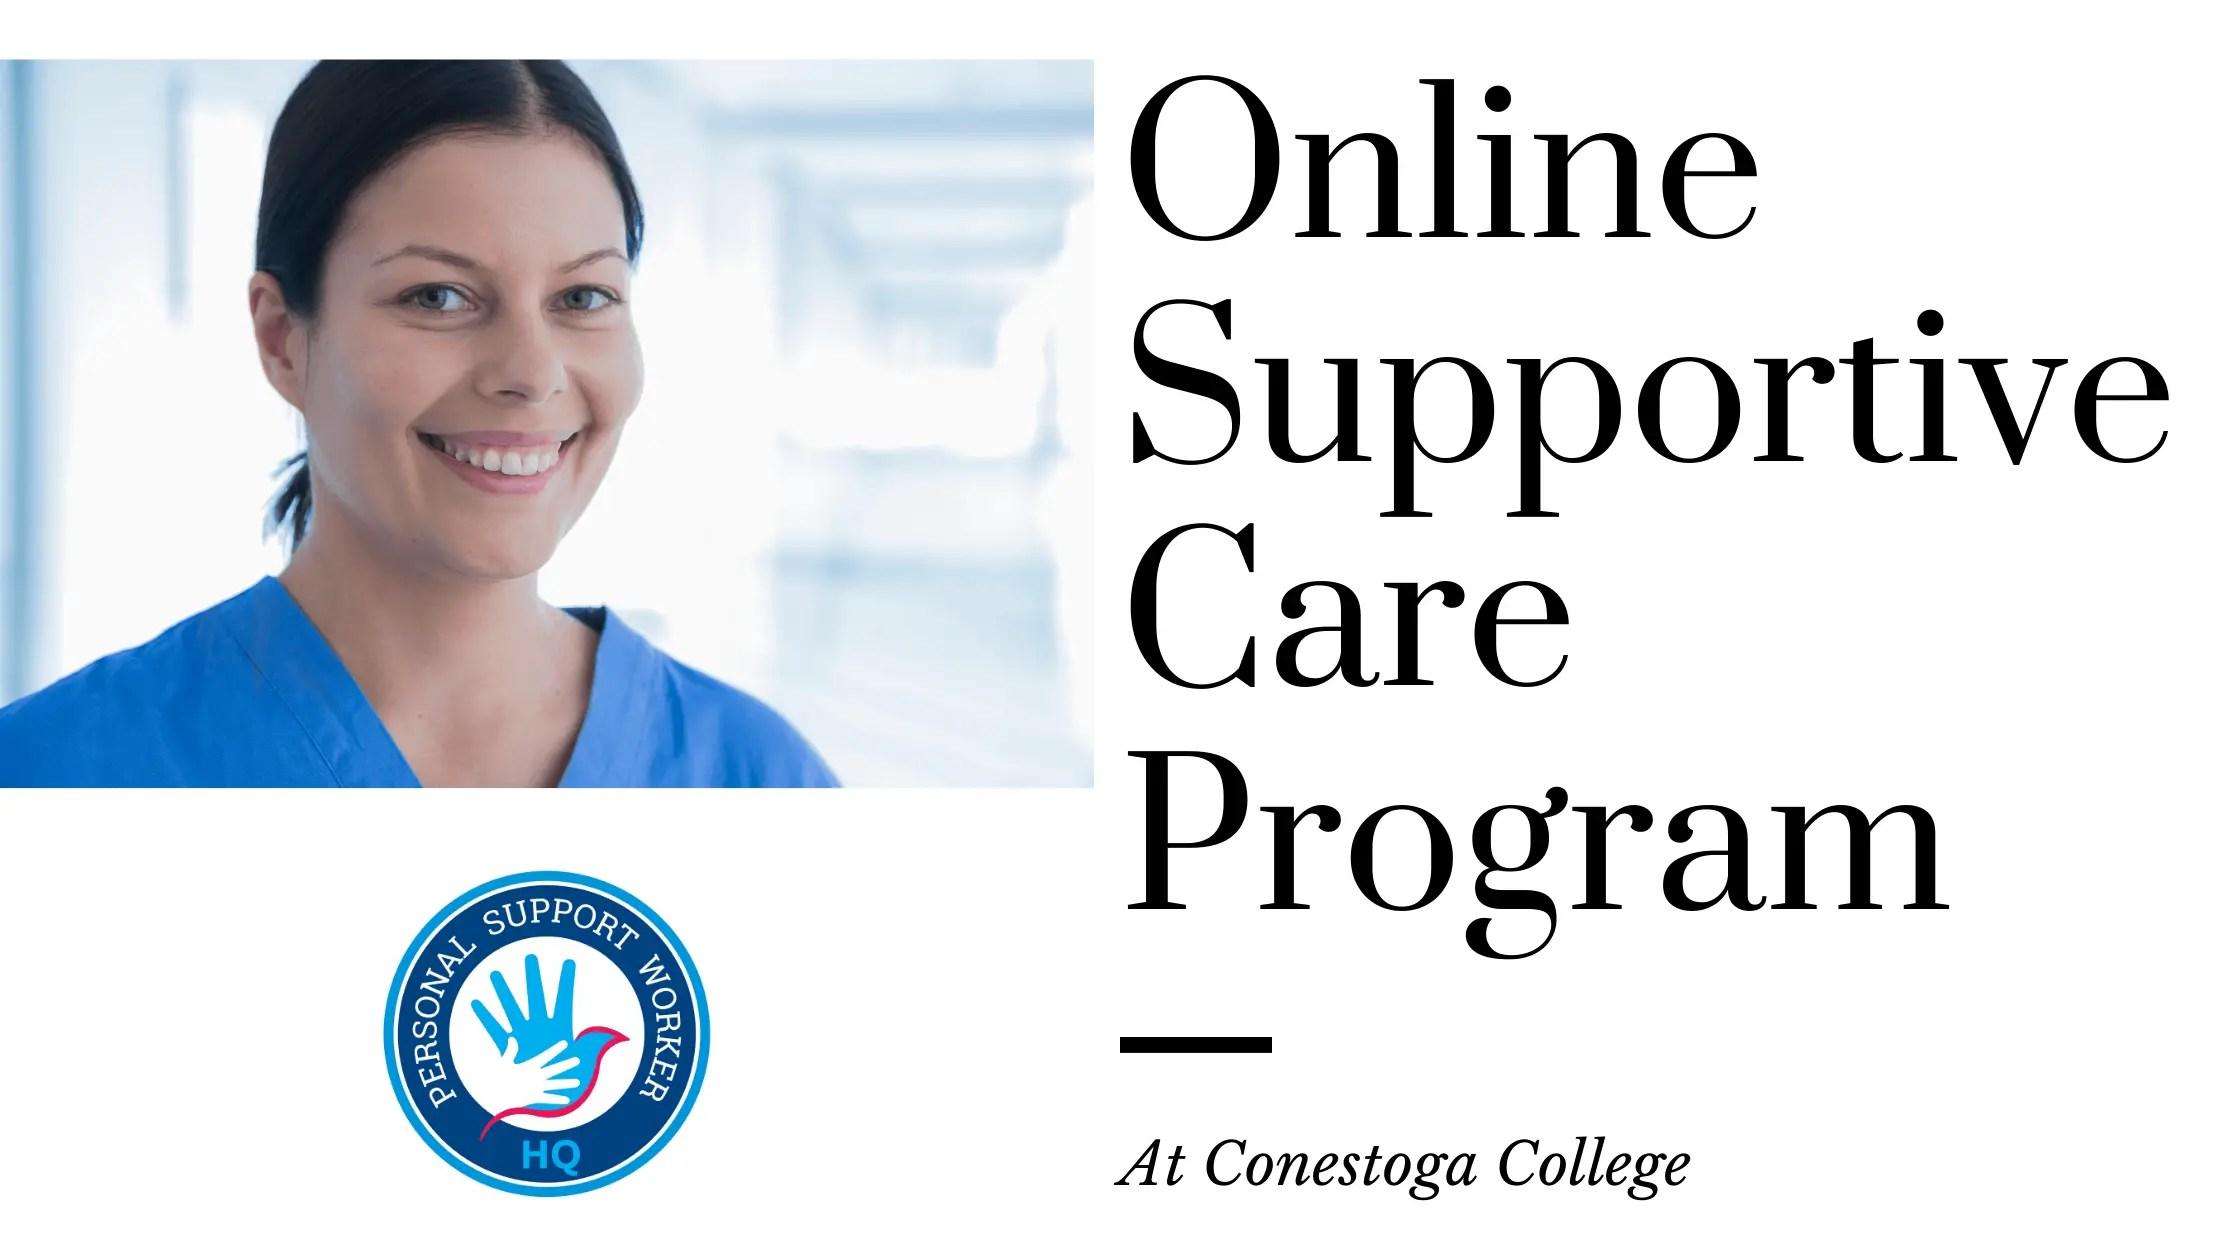 Free Online Supportive Care Program at Conestoga College